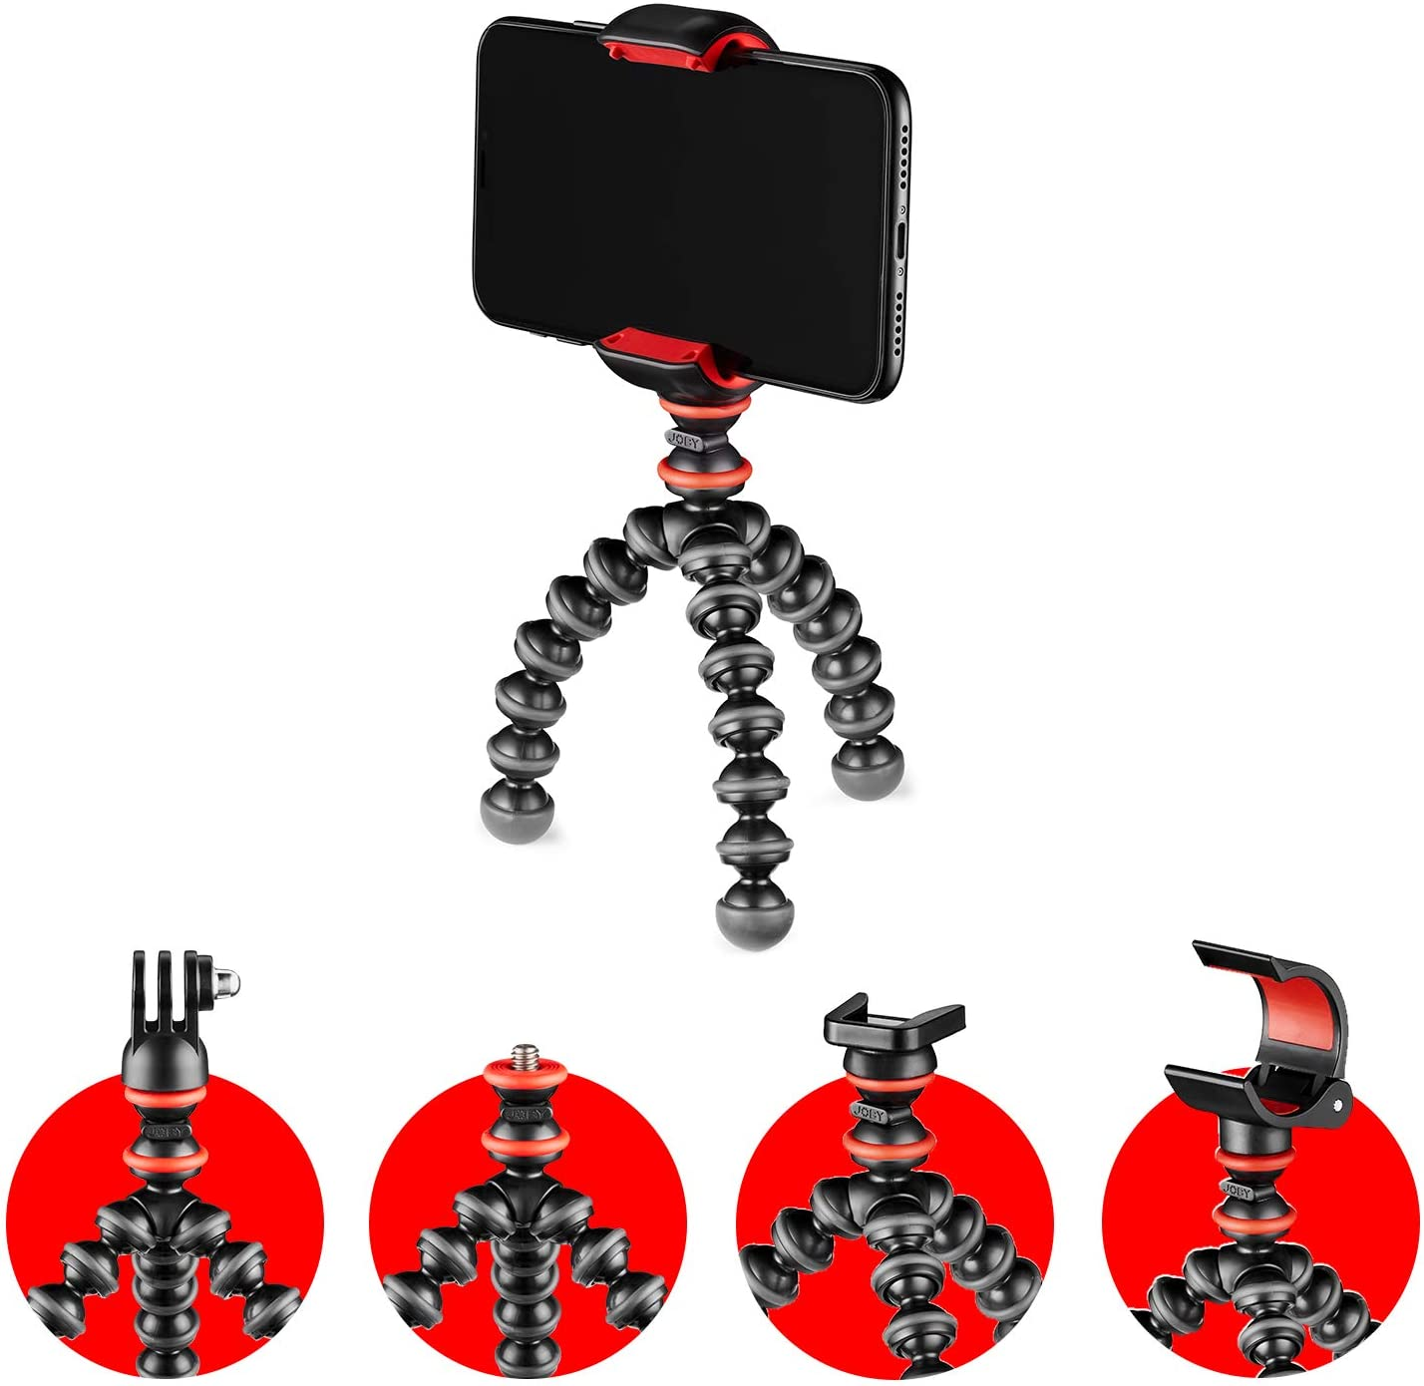 Joby Jb01571 Bww Starter Kit Flexibles Ministativ Mit Kamera